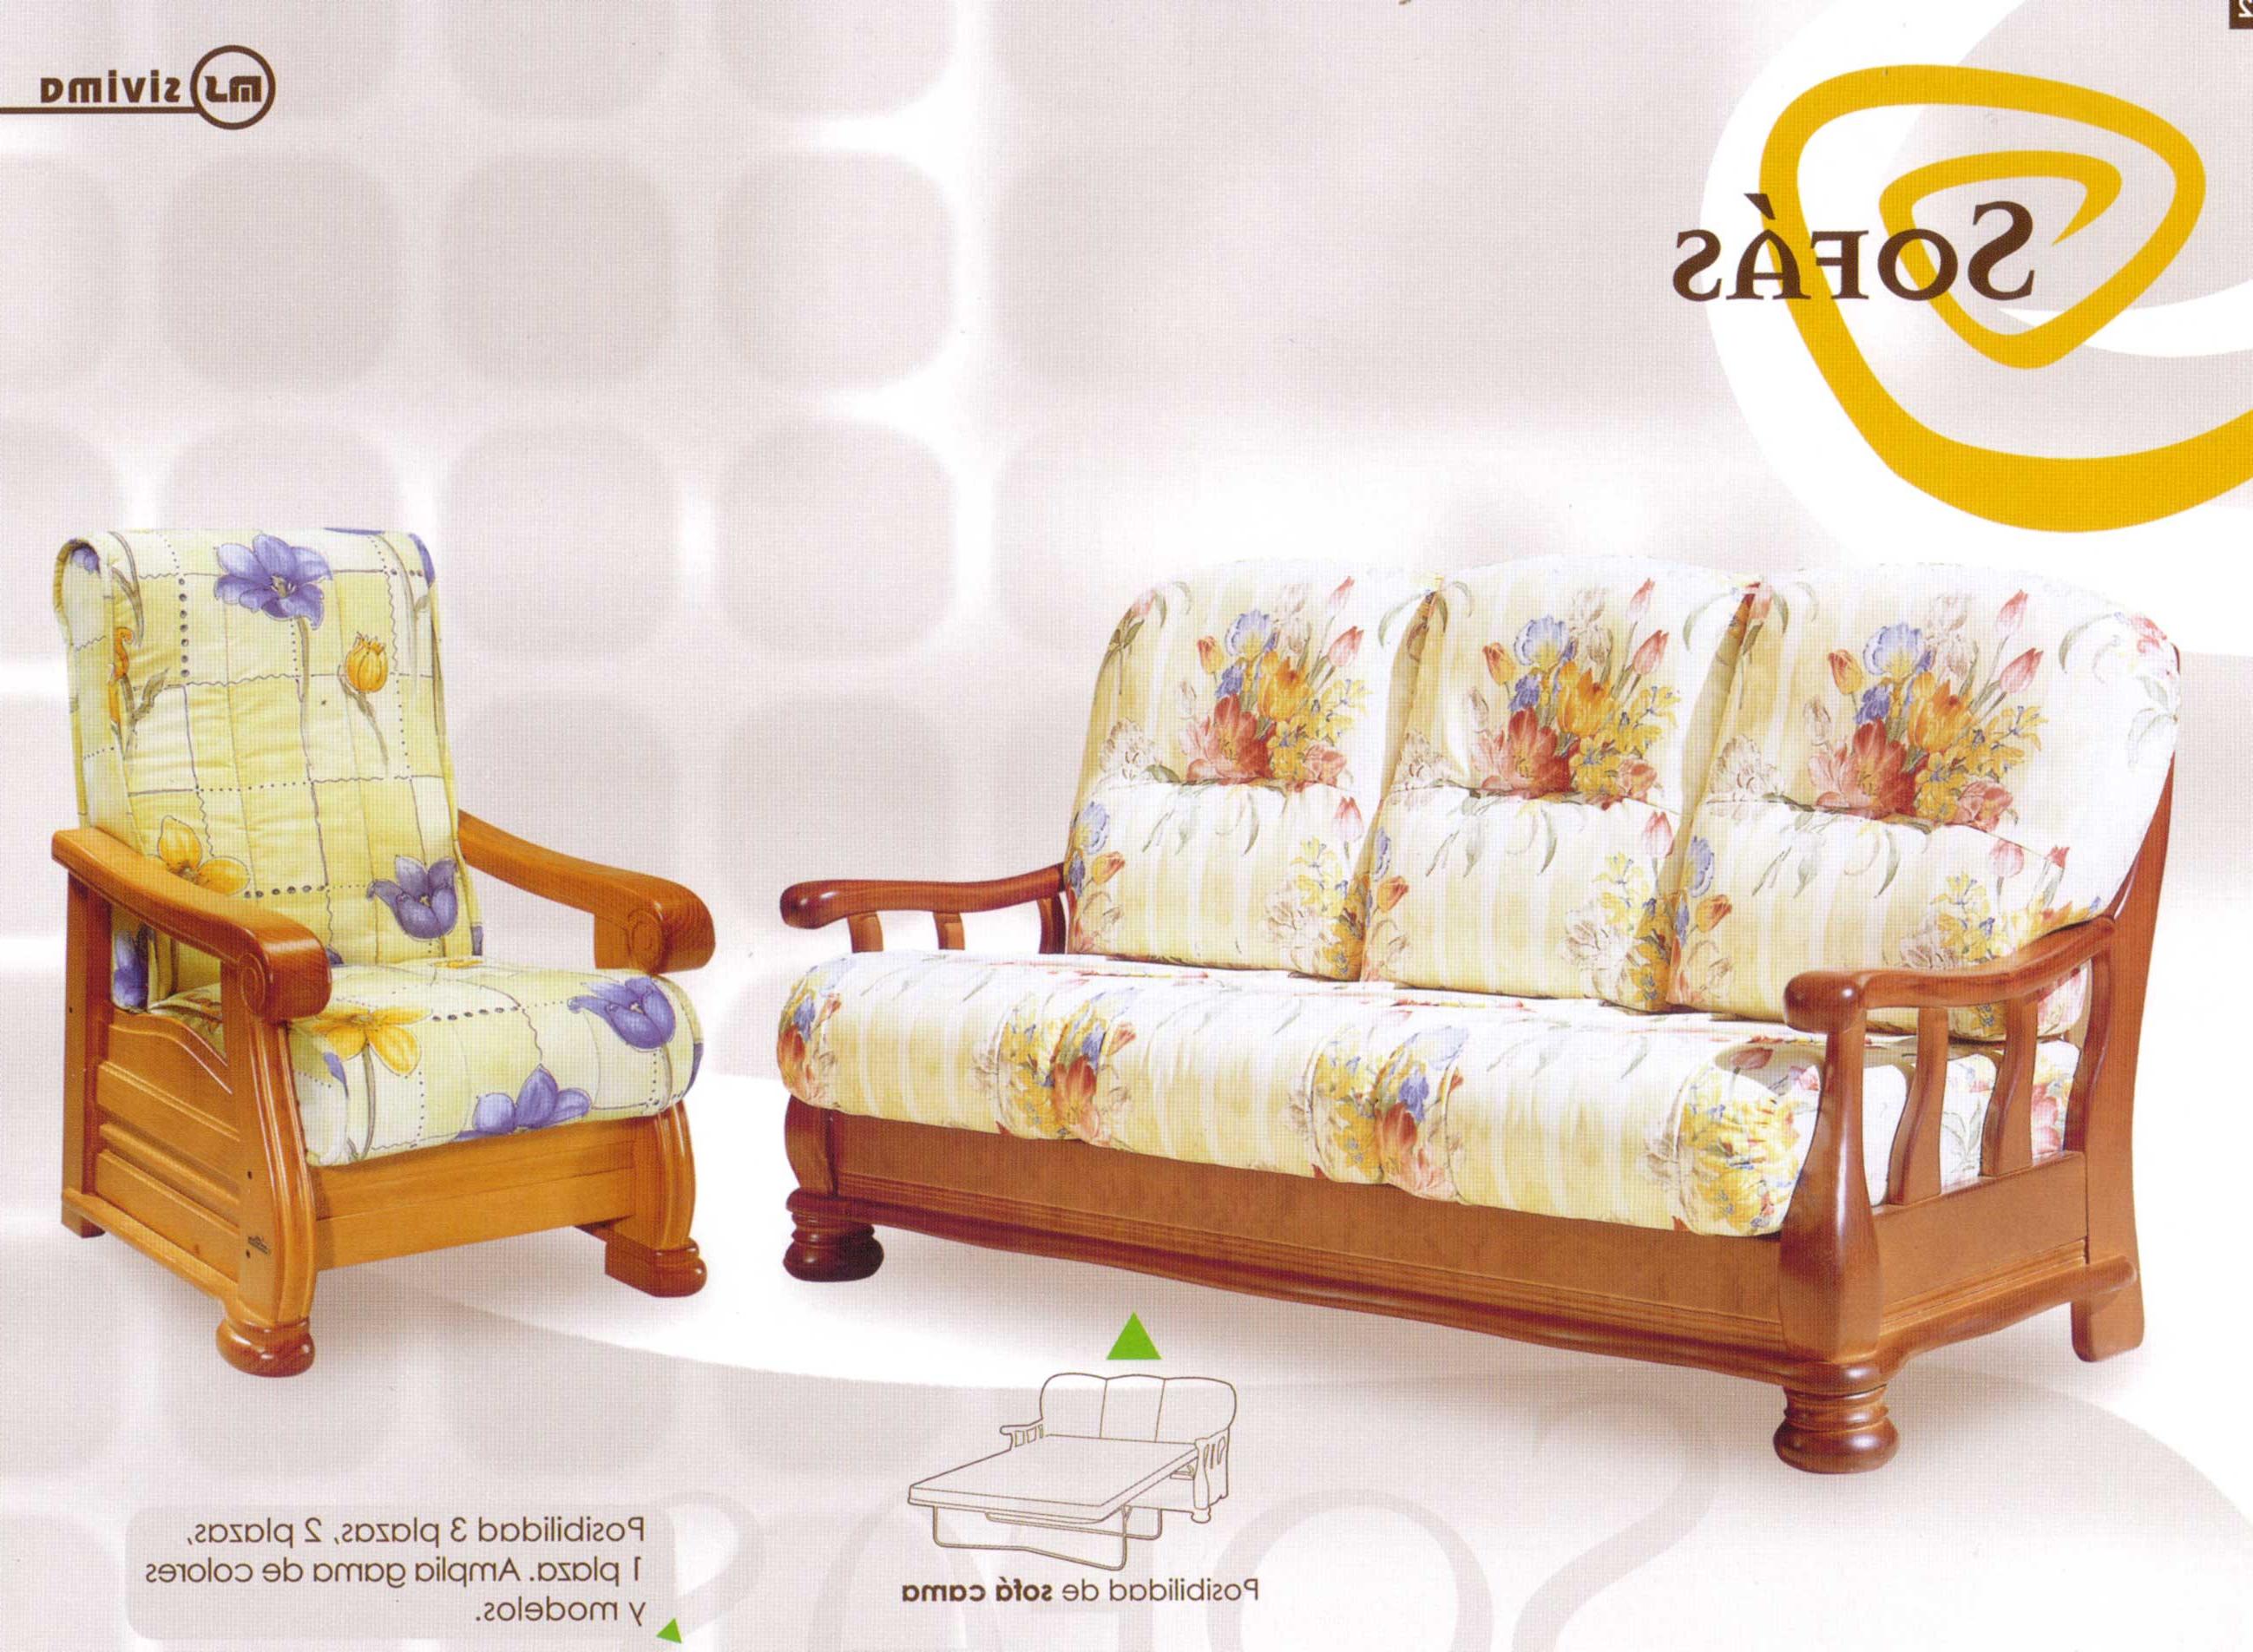 Sofa Cama De Diseño Zwdg sofa Cama Diseà O Diseà O A Sala Cuartoz